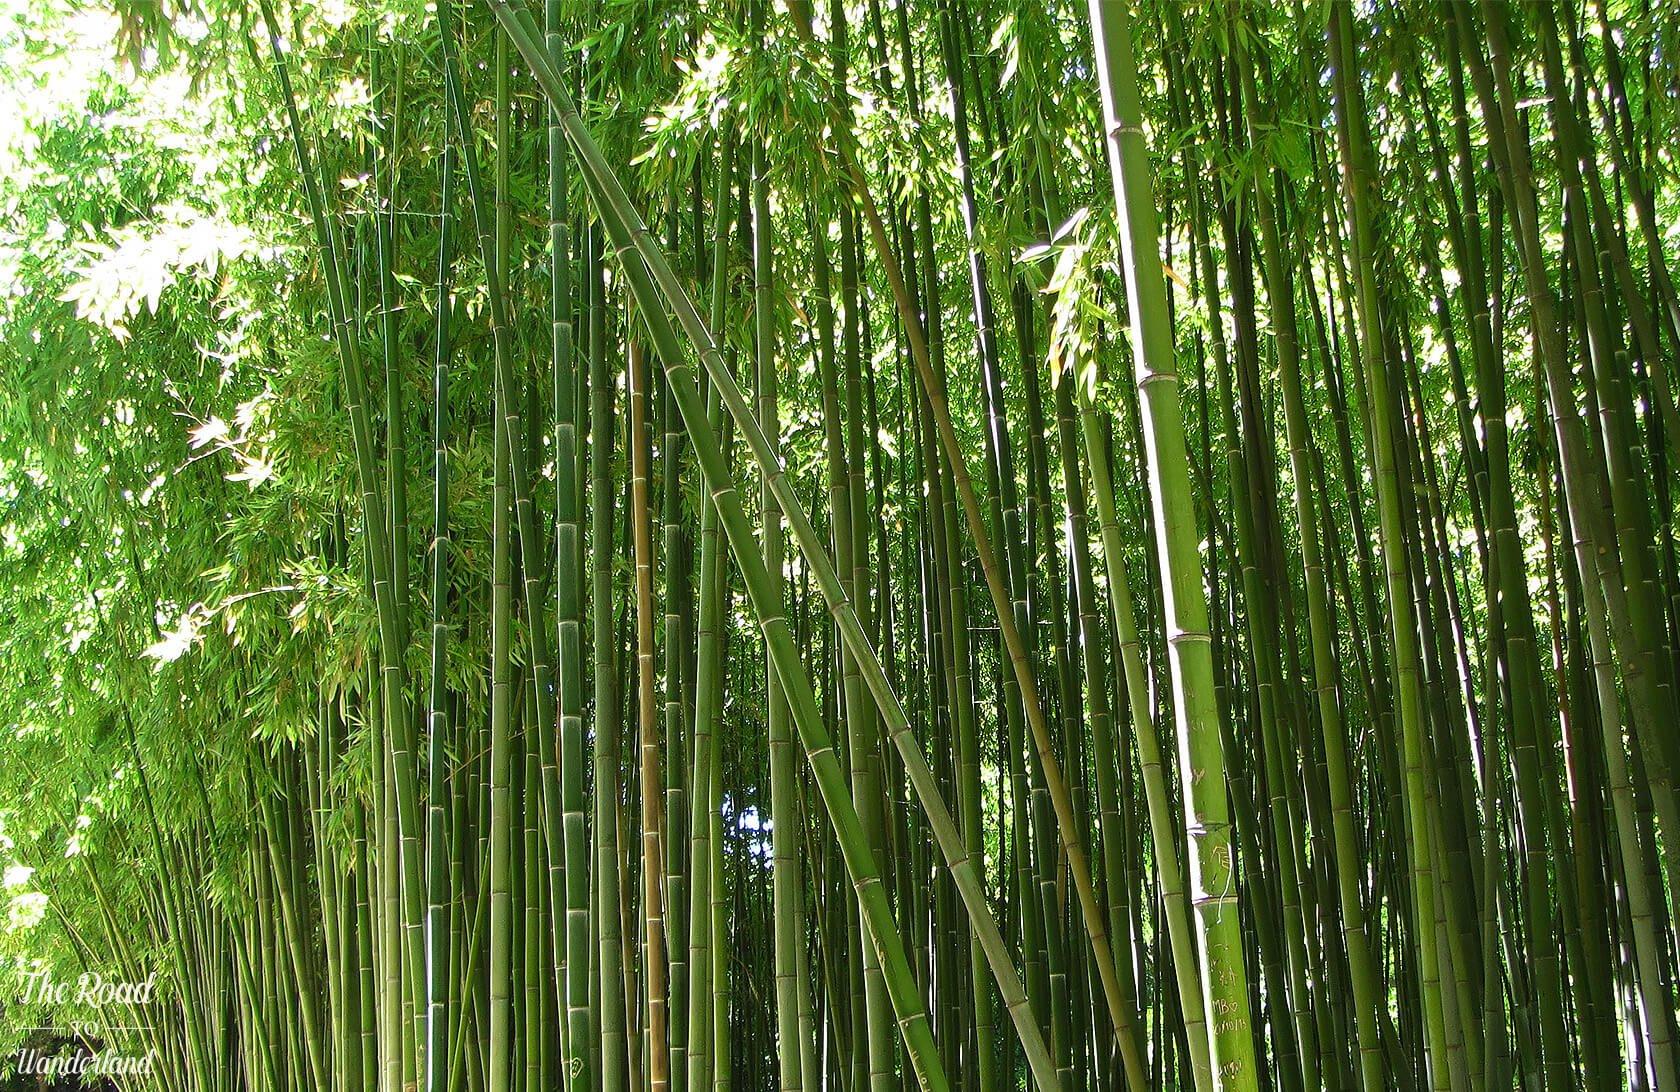 Bamboo Forest, Jardin des Plantes